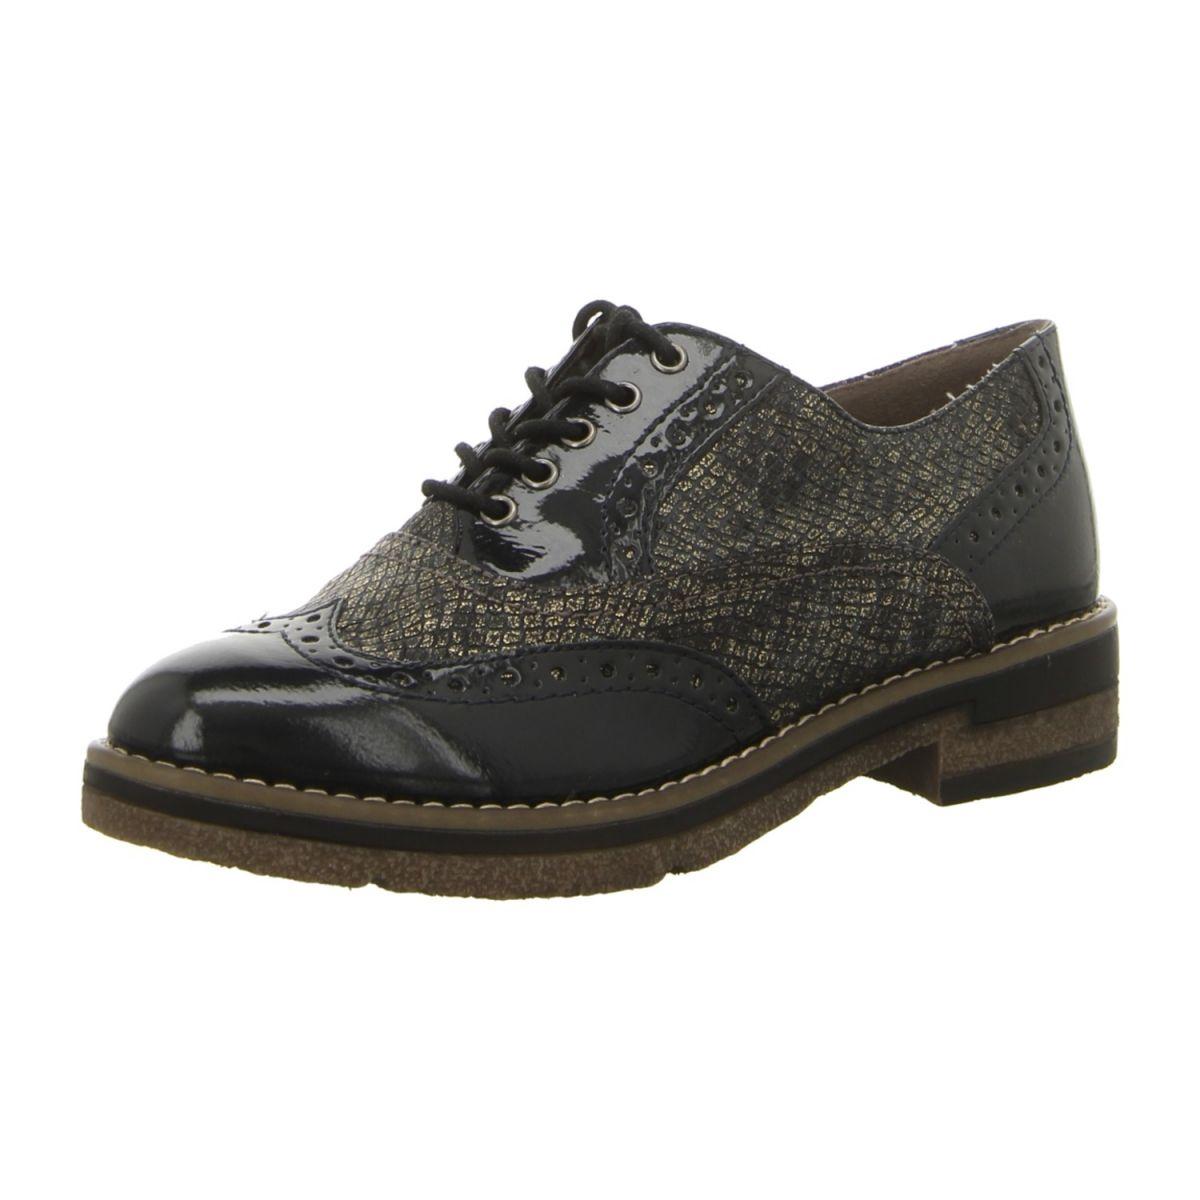 Tamaris  Zapatos (grau)  Schnürschuh 1-1-23712-29-243 anthr. Struct. (grau) Zapatos NEU 1a9fed